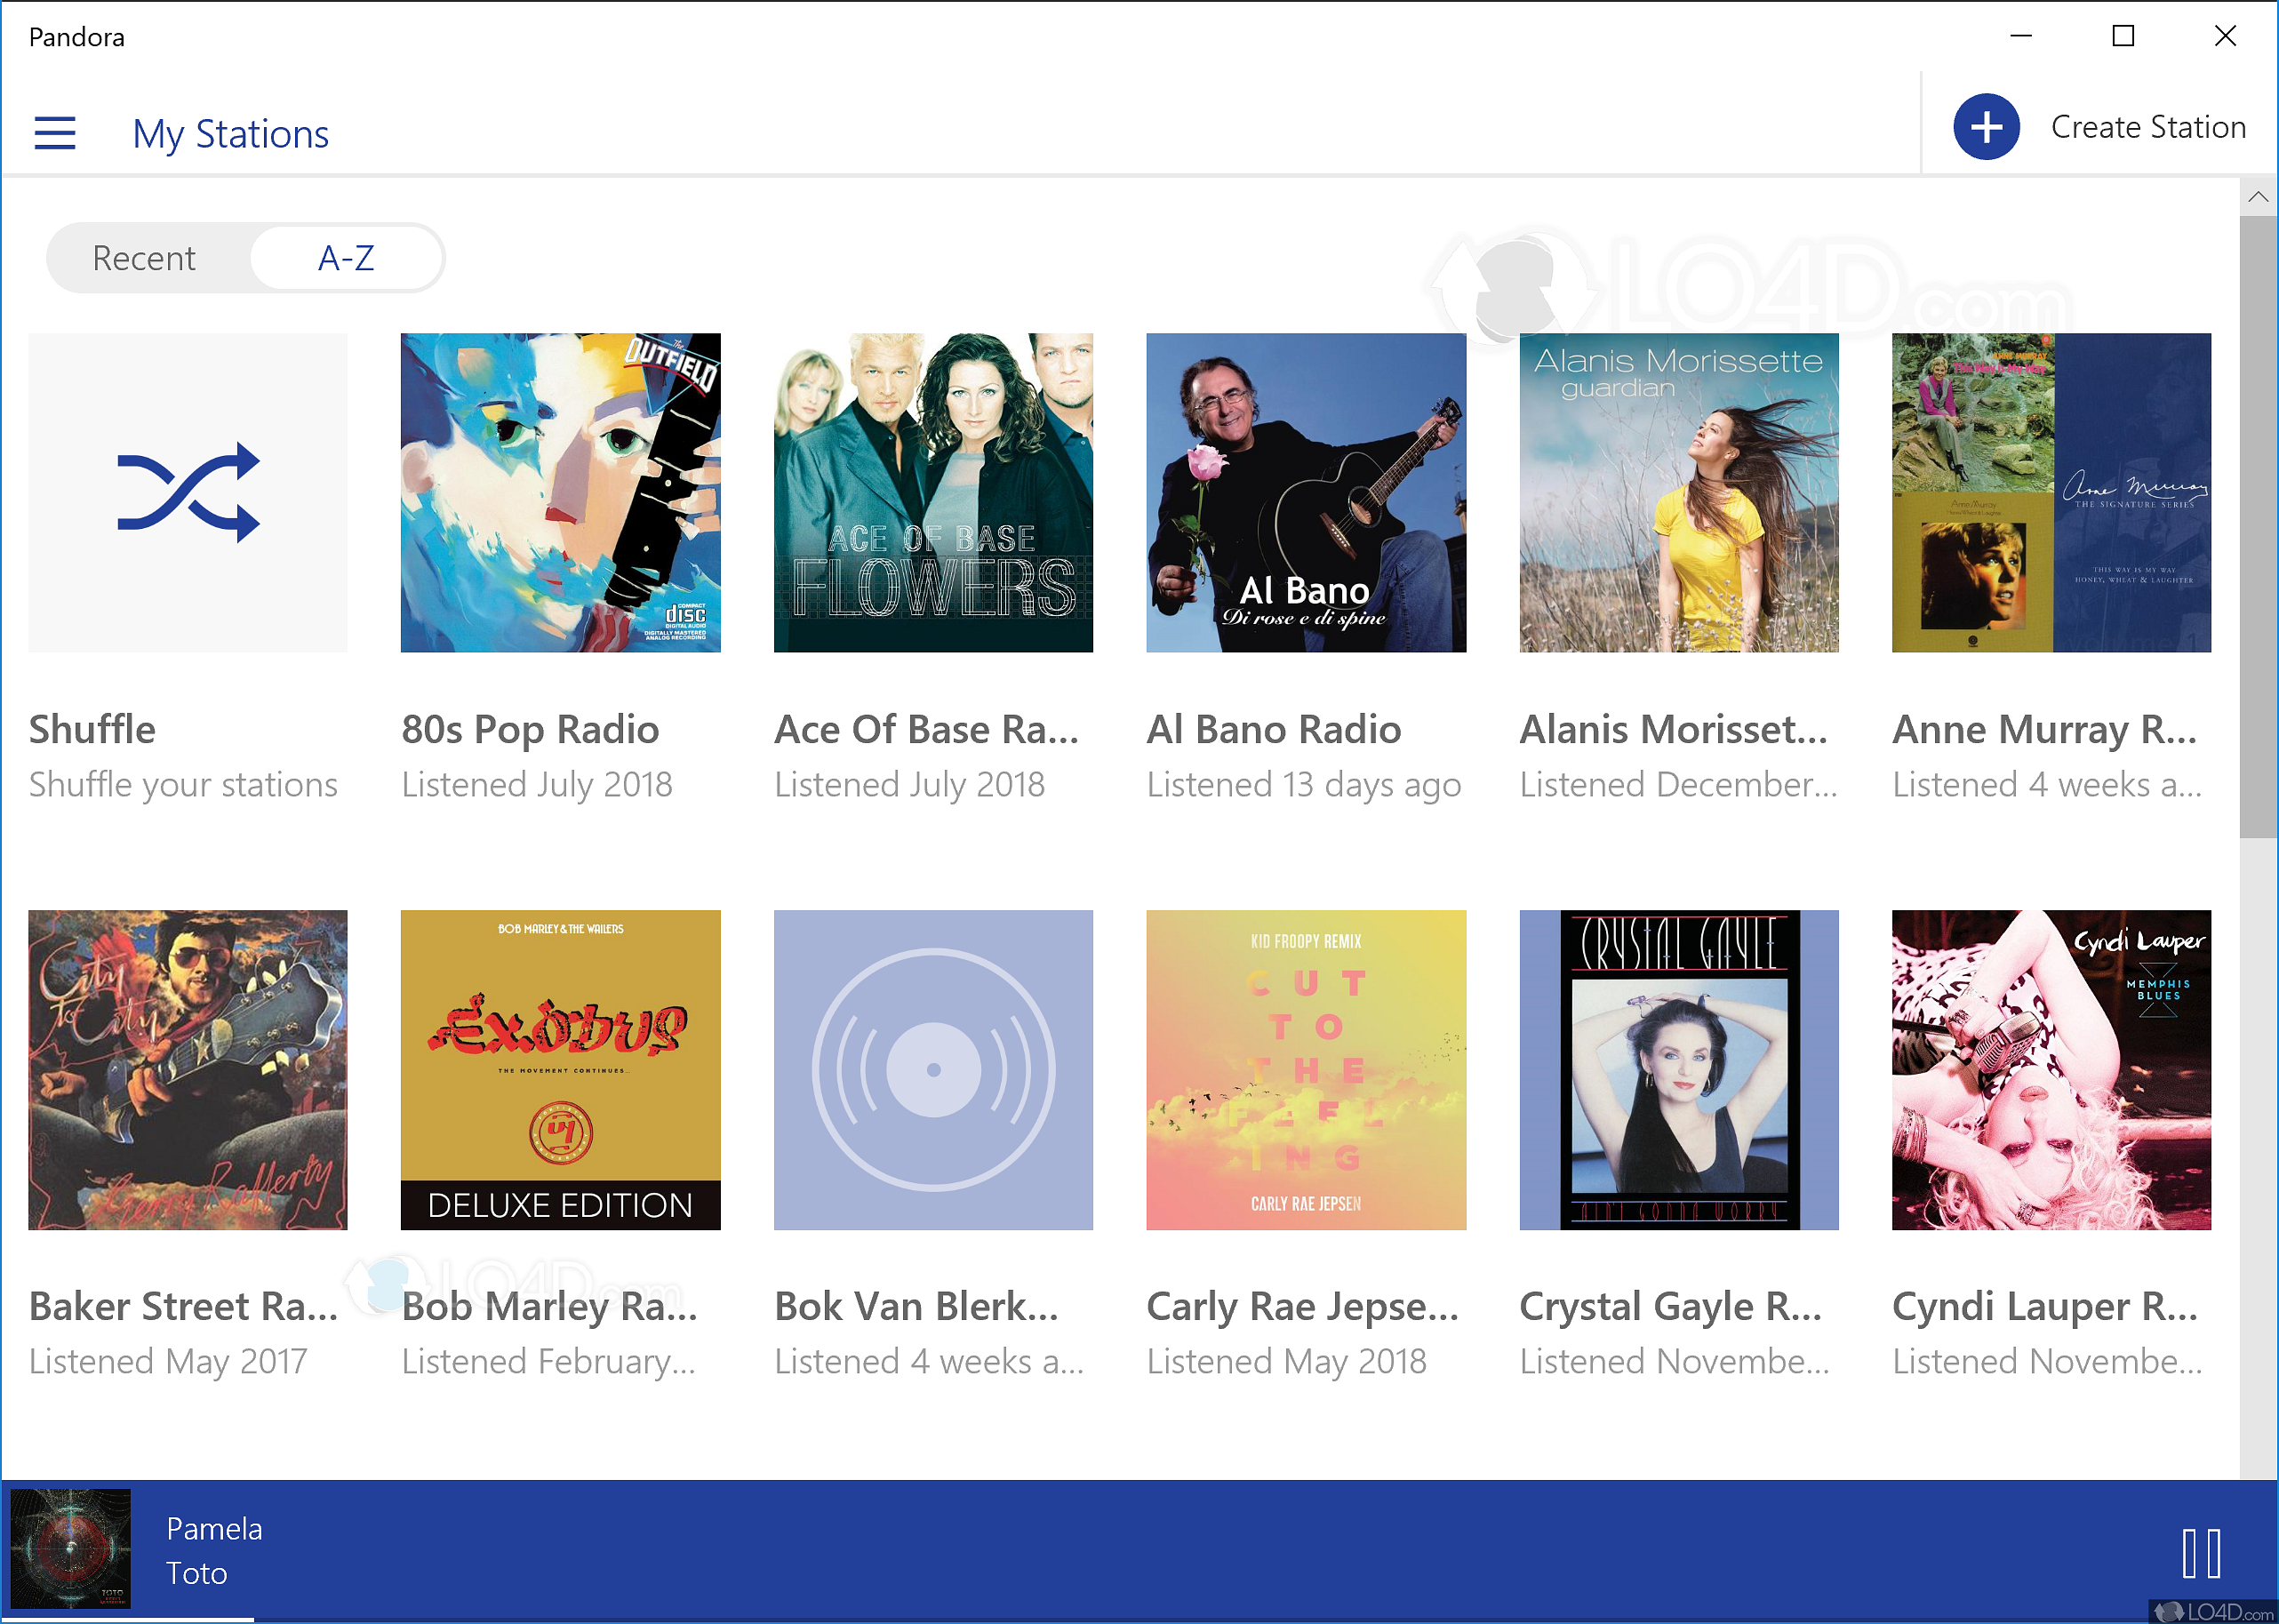 Pandora gadget Windows 8 - LO4D com